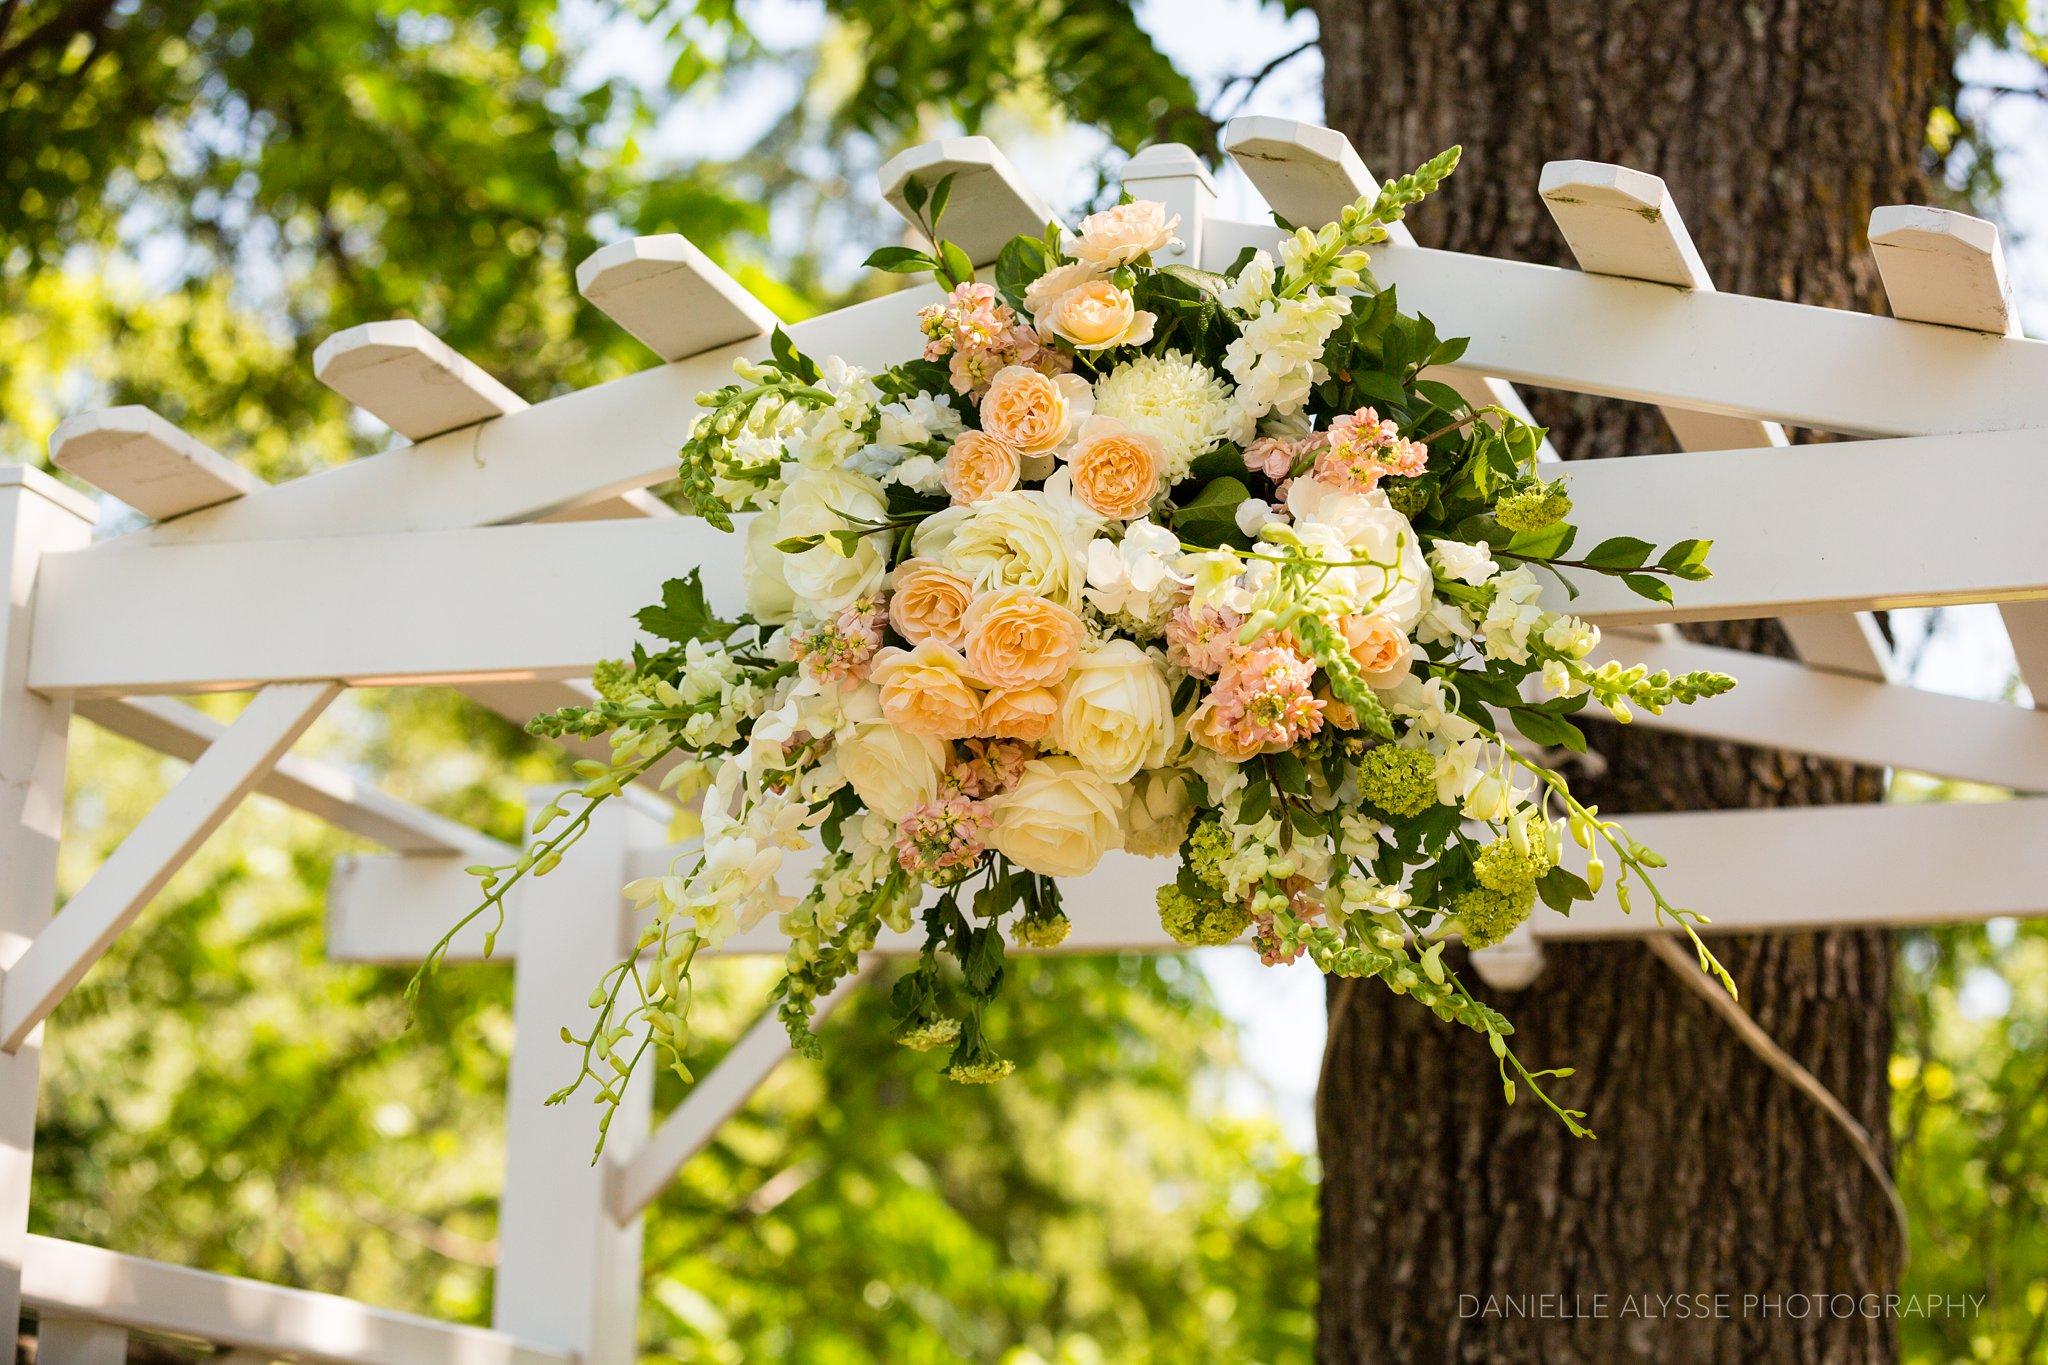 170507_blog_megan_david_wedding_loomis_flower_farm_inn_danielle_alysse_photography_sacramento_photographer0126_WEB.jpg